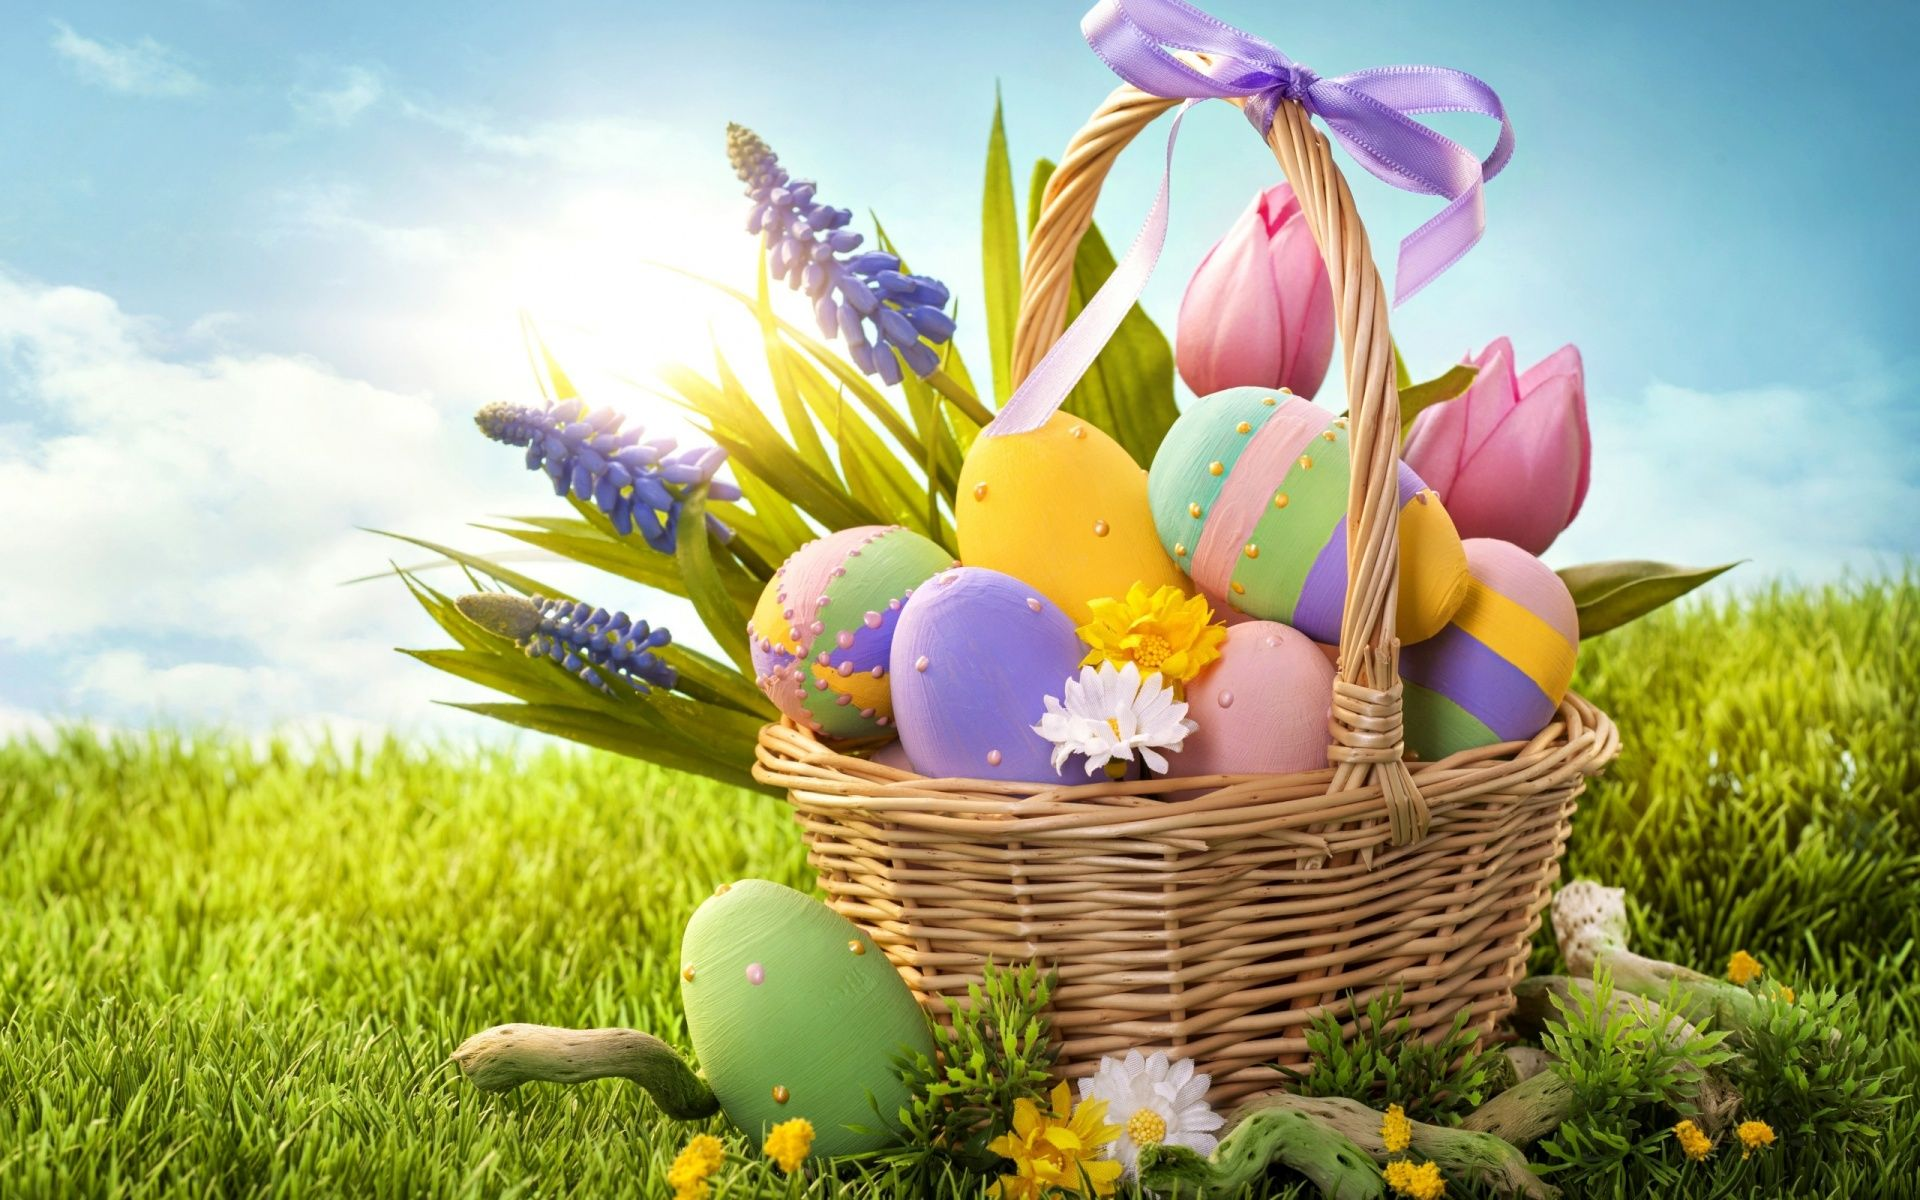 Pin by hsktnk on easter | Pinterest | Holiday wallpaper, Easter ... for Easter Eggs In A Basket Wallpaper  545xkb